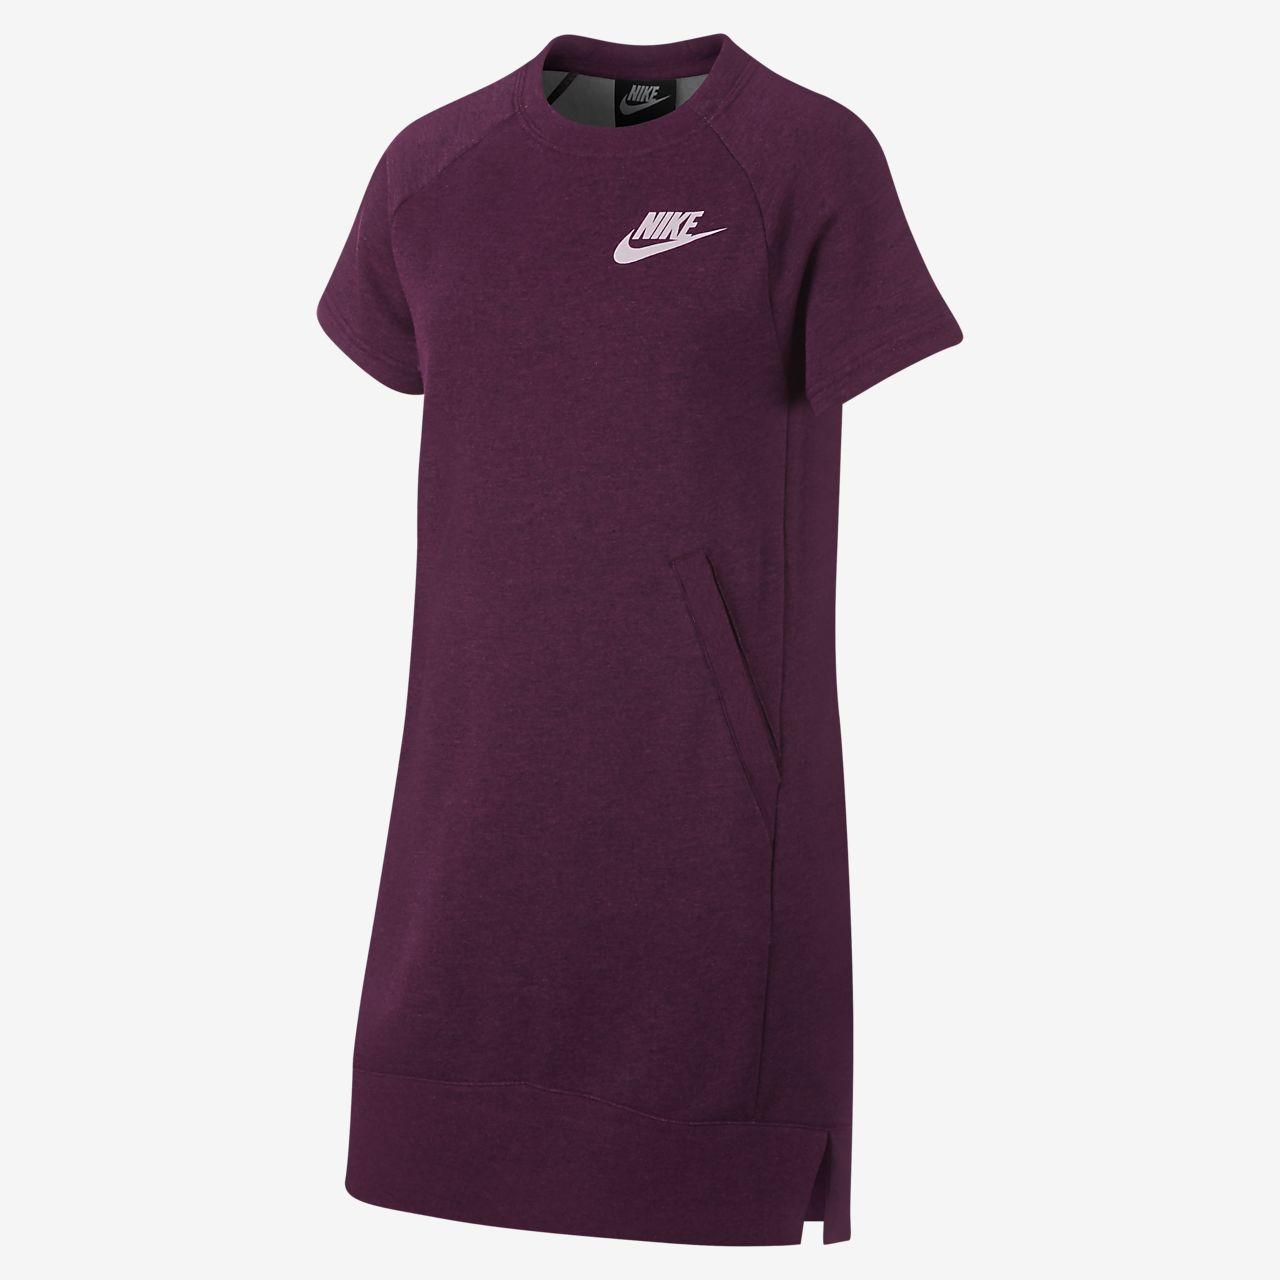 uk availability 44150 e2625 ... Nike Sportswear Fleece-Kleid für ältere Kinder (Mädchen)